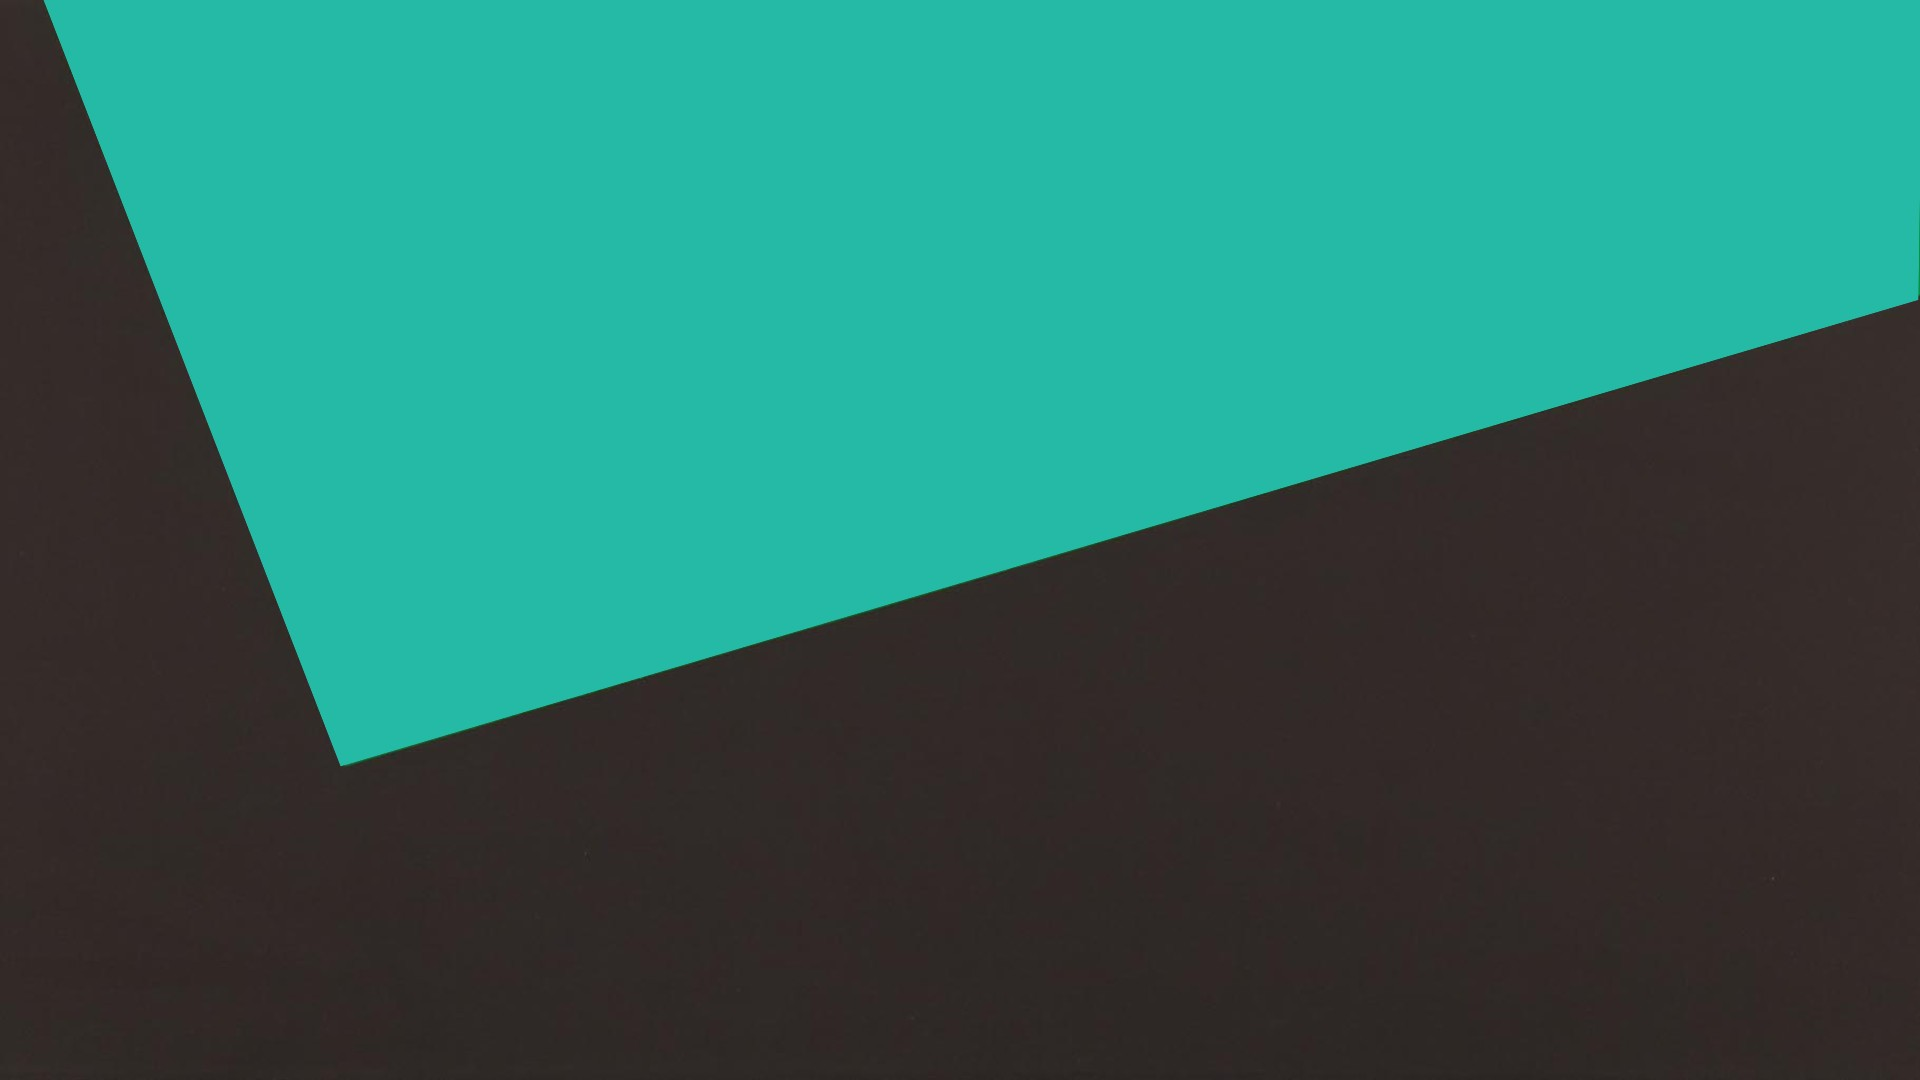 General 1920x1080 minimalism abstract Carmen Herrera teal